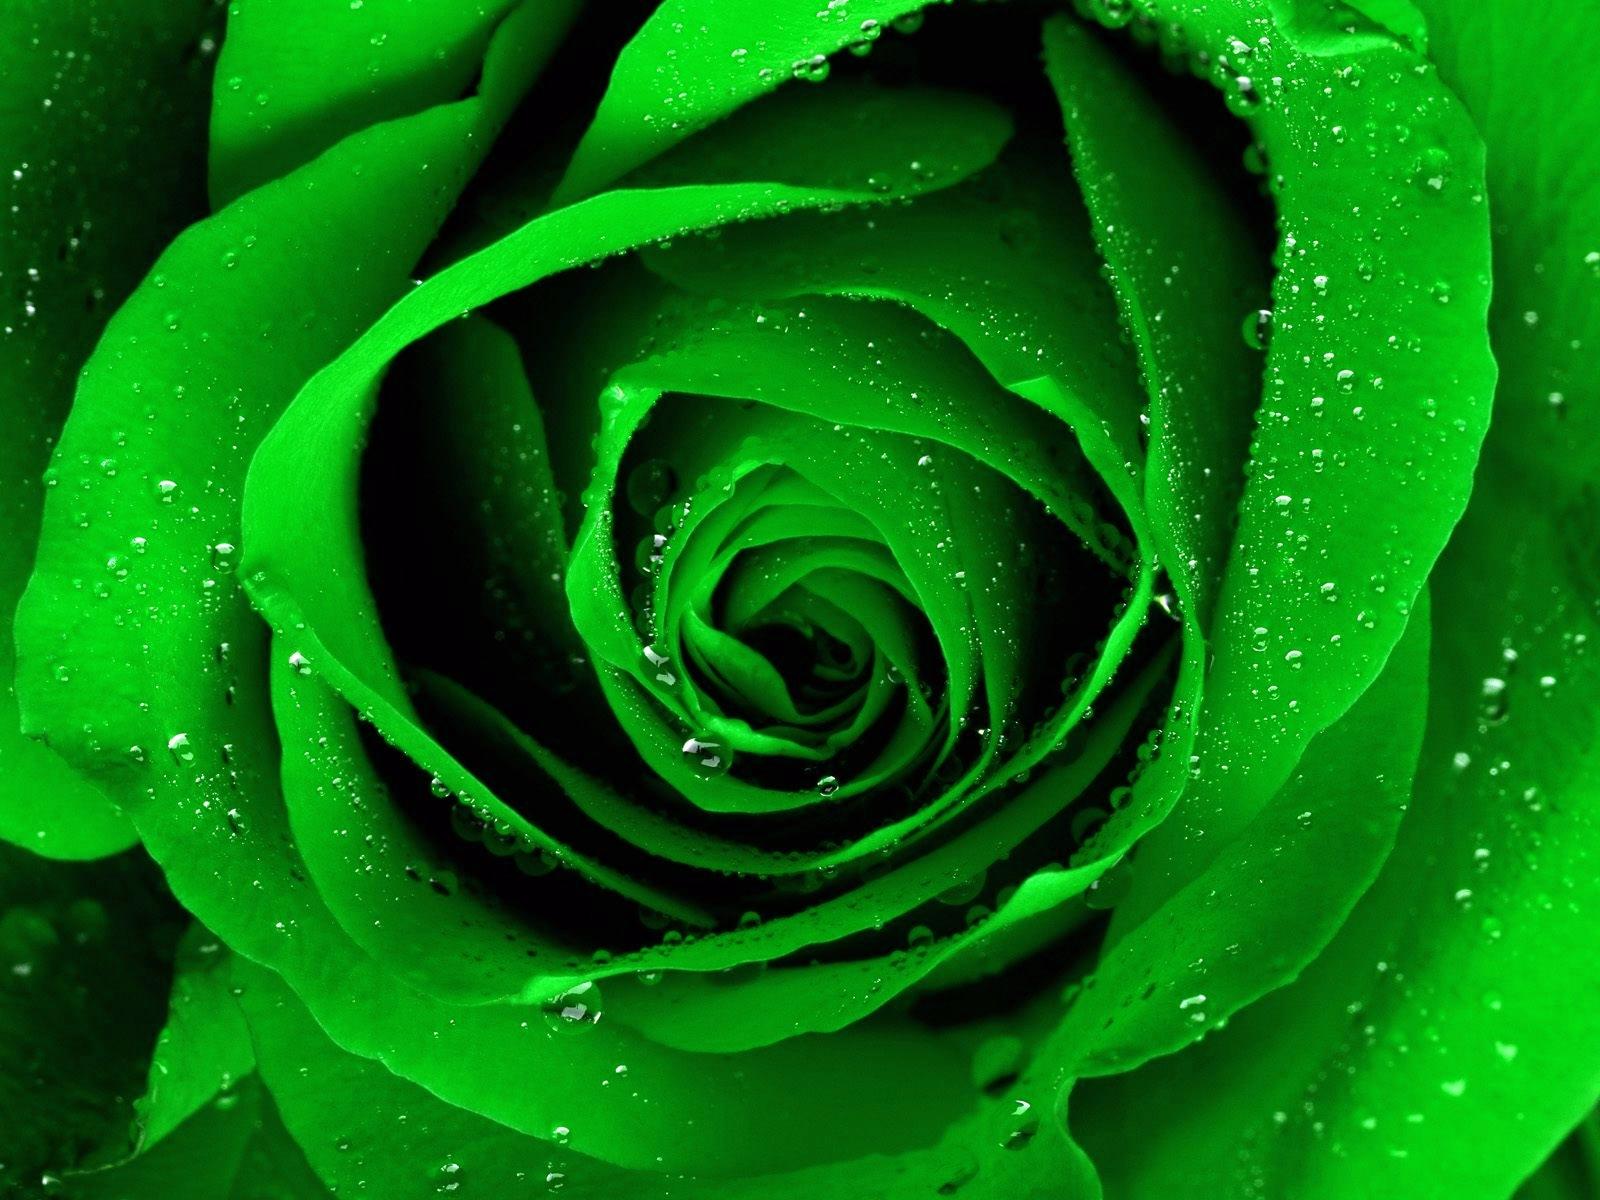 dark green rose picture